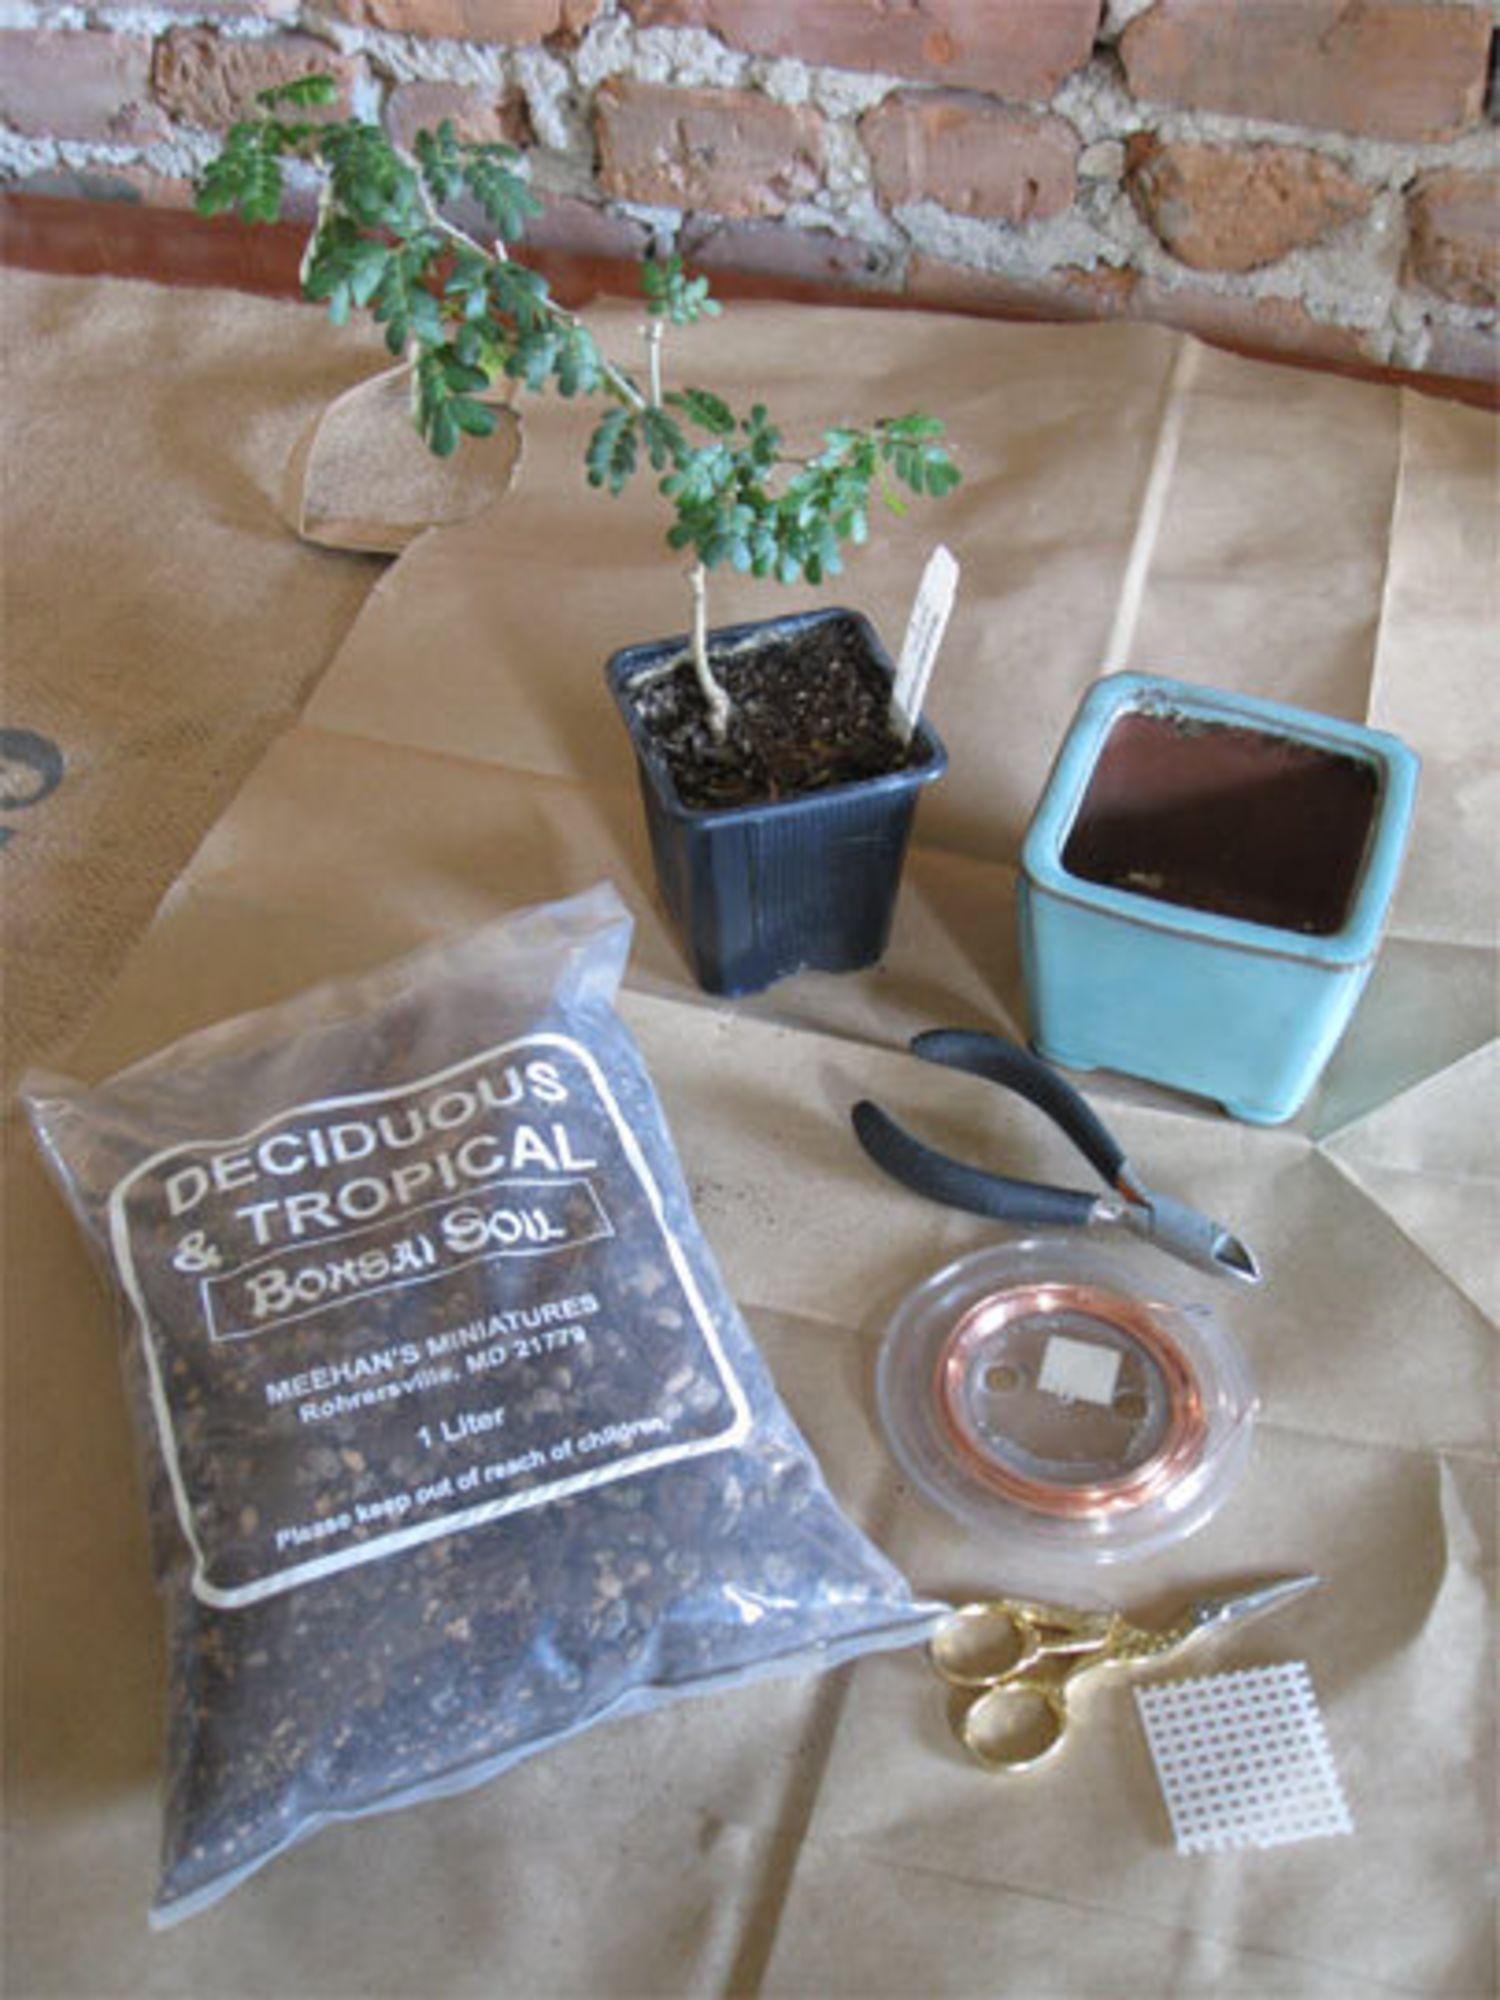 How To Pot & Care For a Bonsai Bonsai tree care, Bonsai